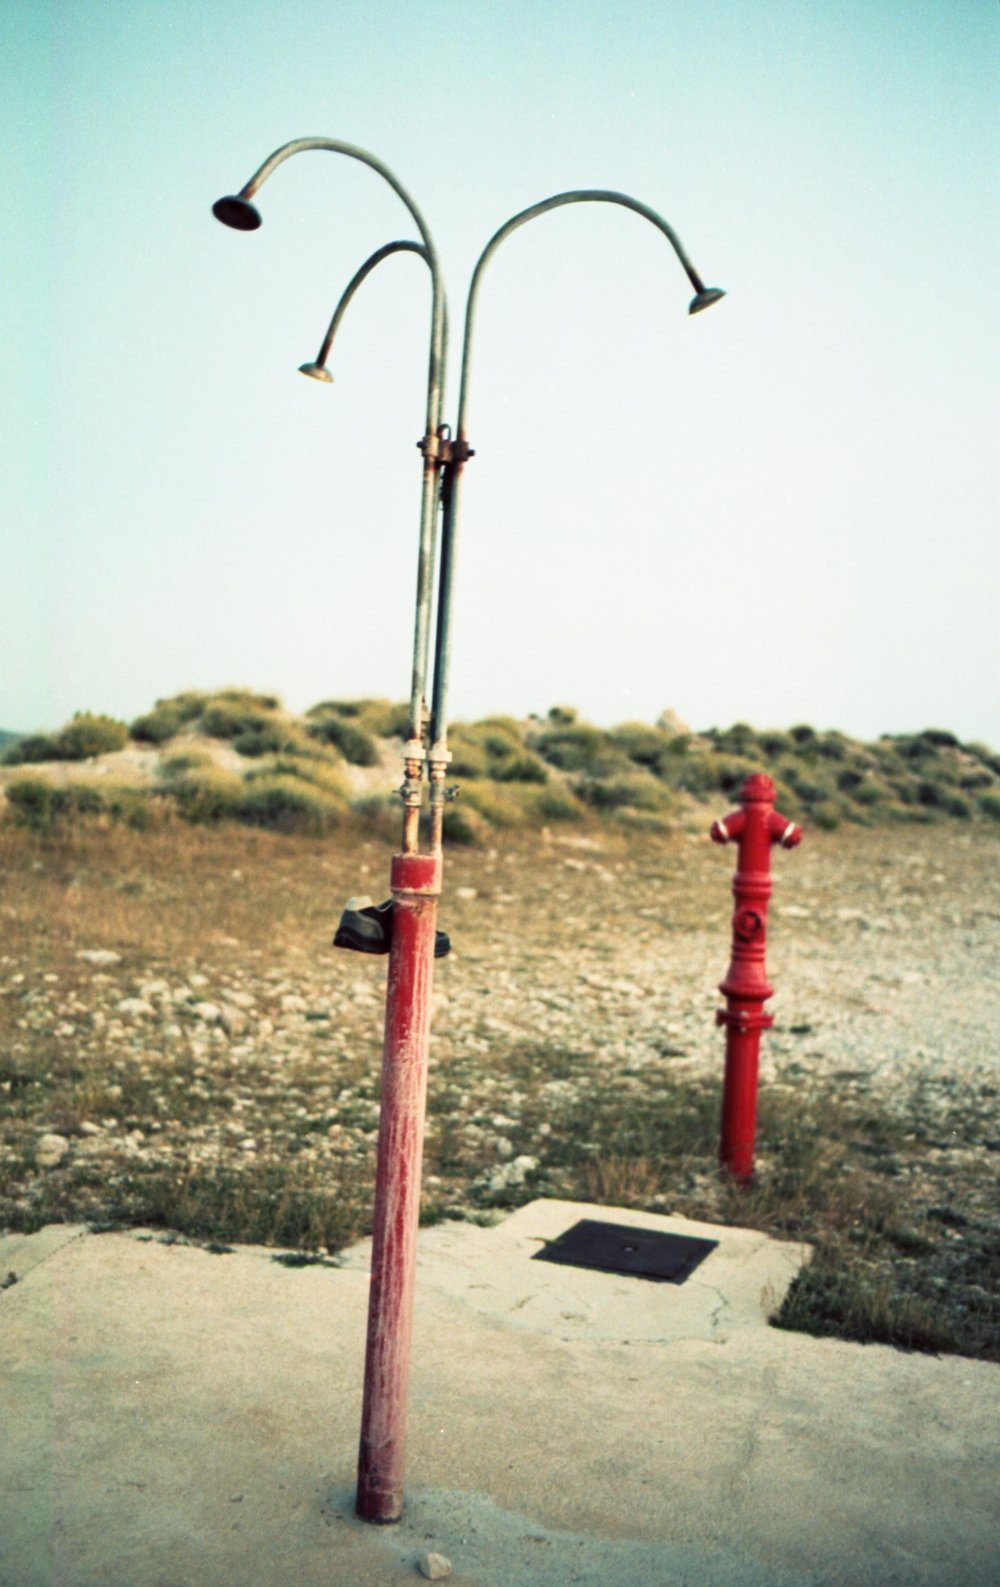 Kroatien, Cres, 2018   Kodak Portra 160, Leica M6 50mm summicron